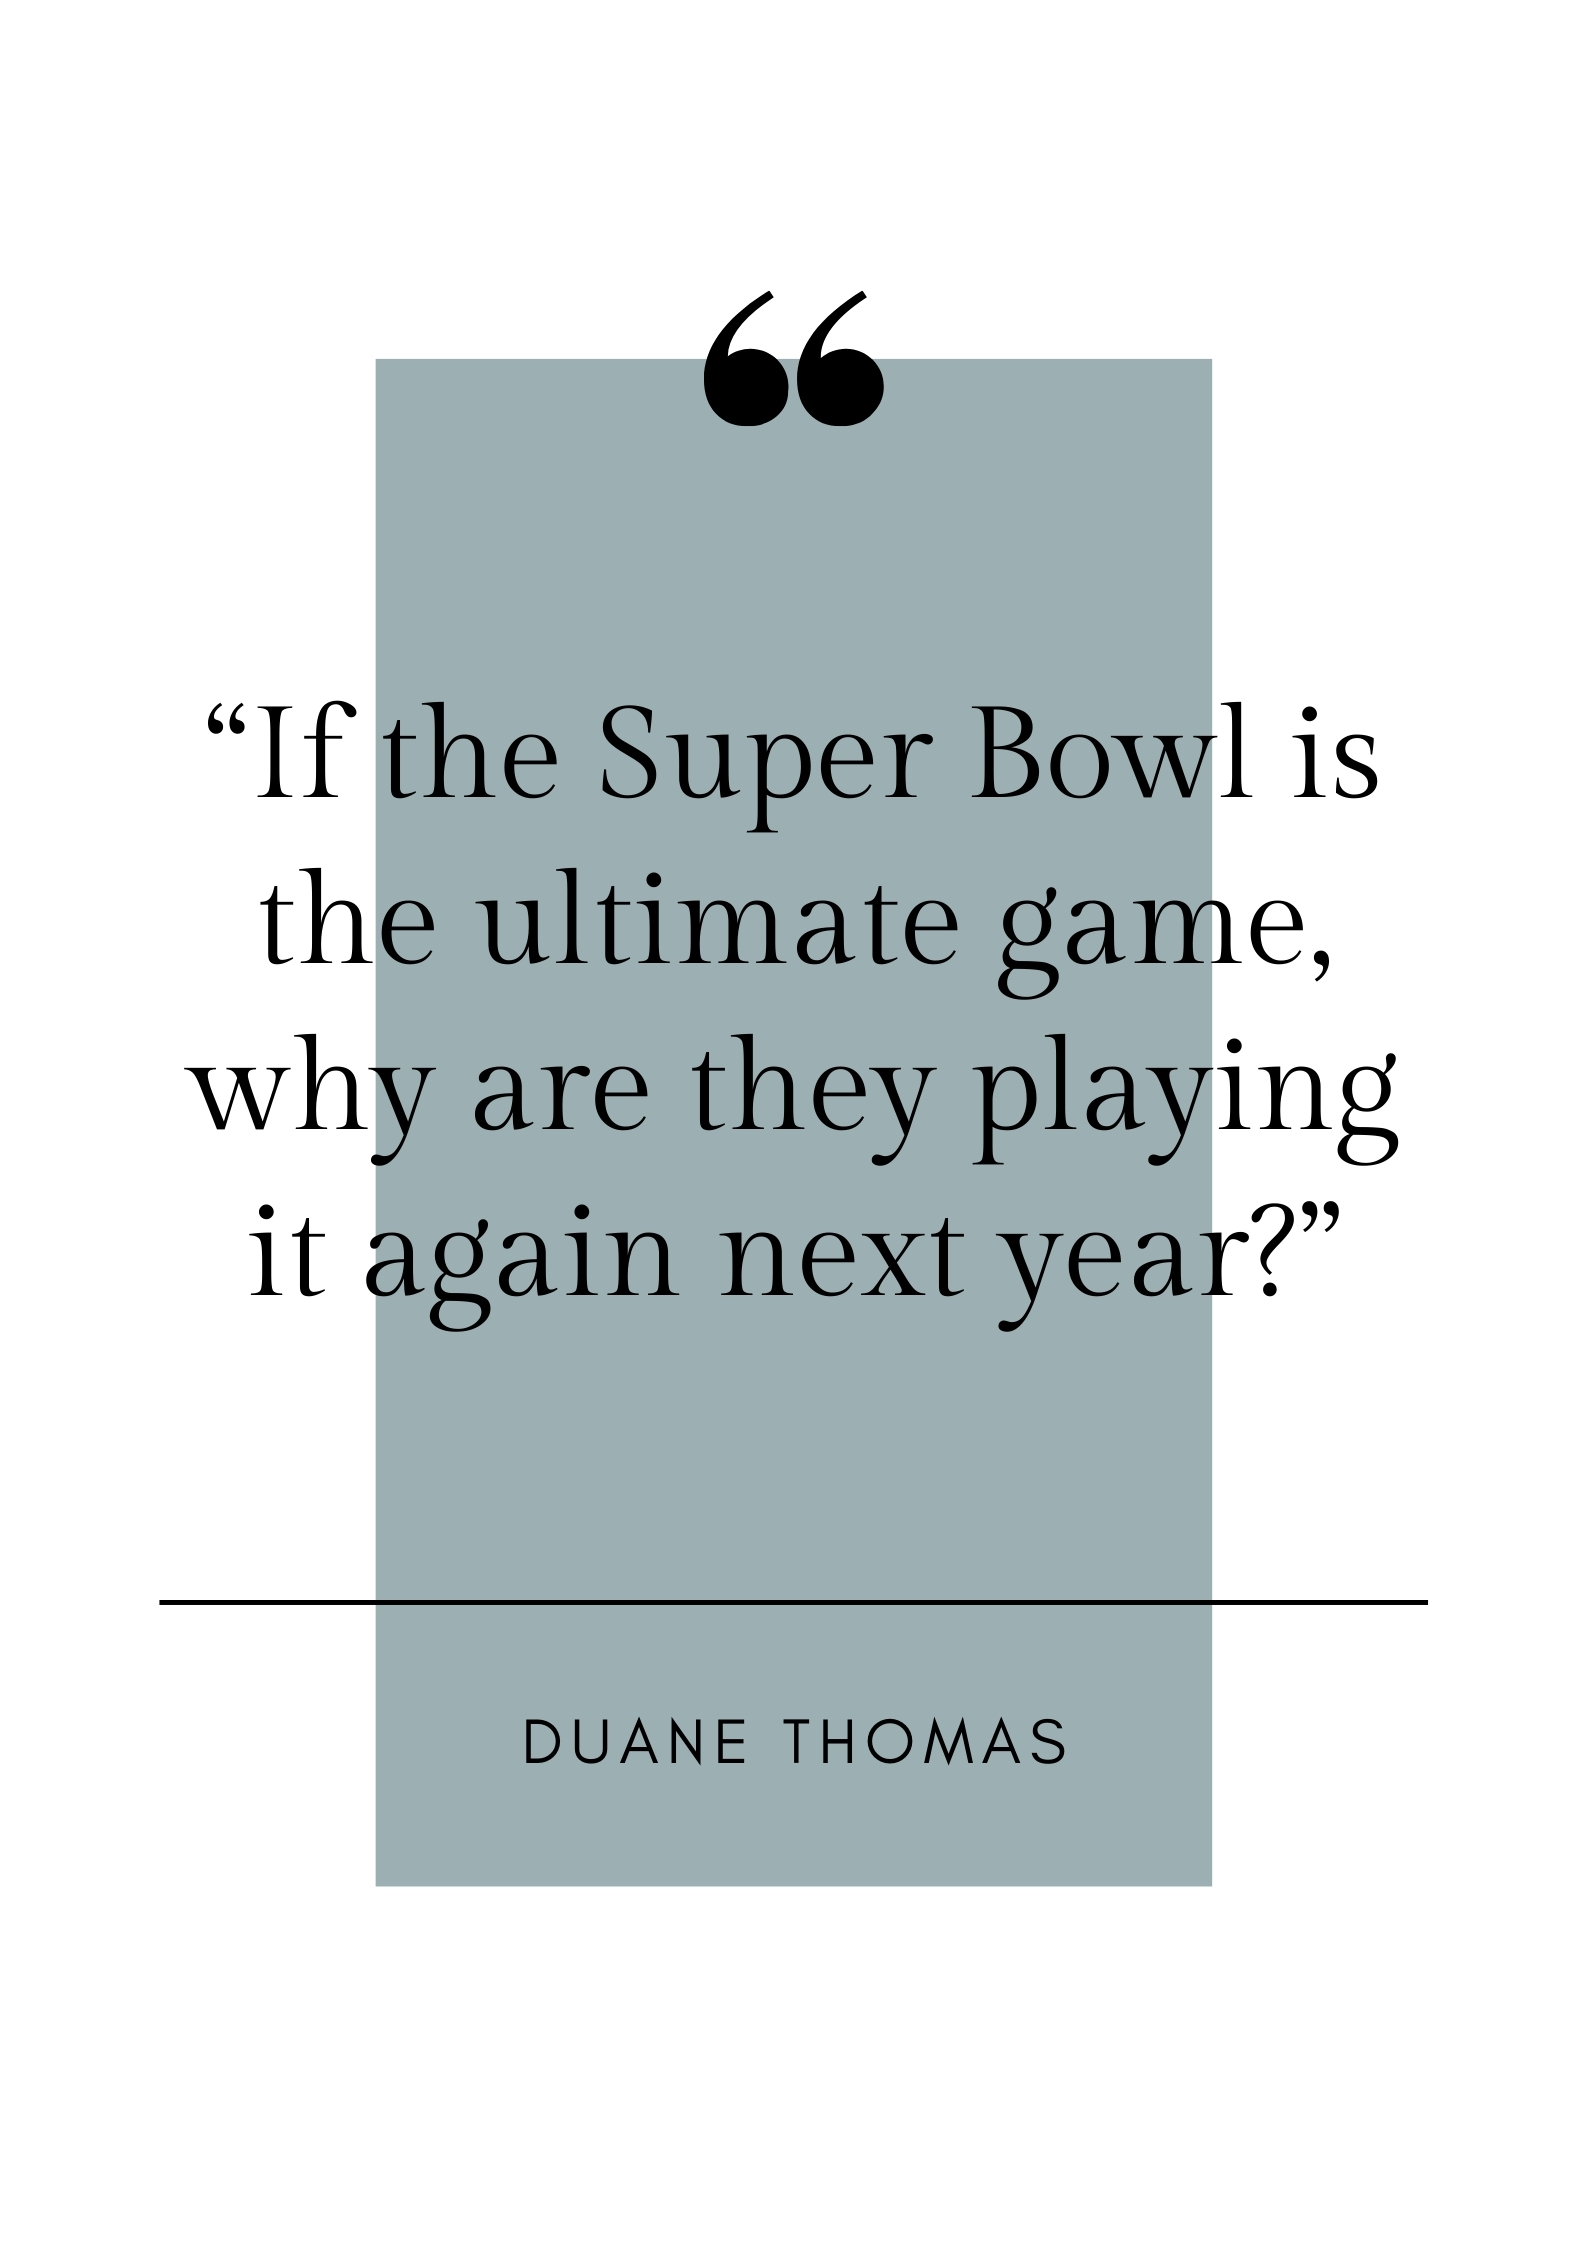 duane thomas football quote